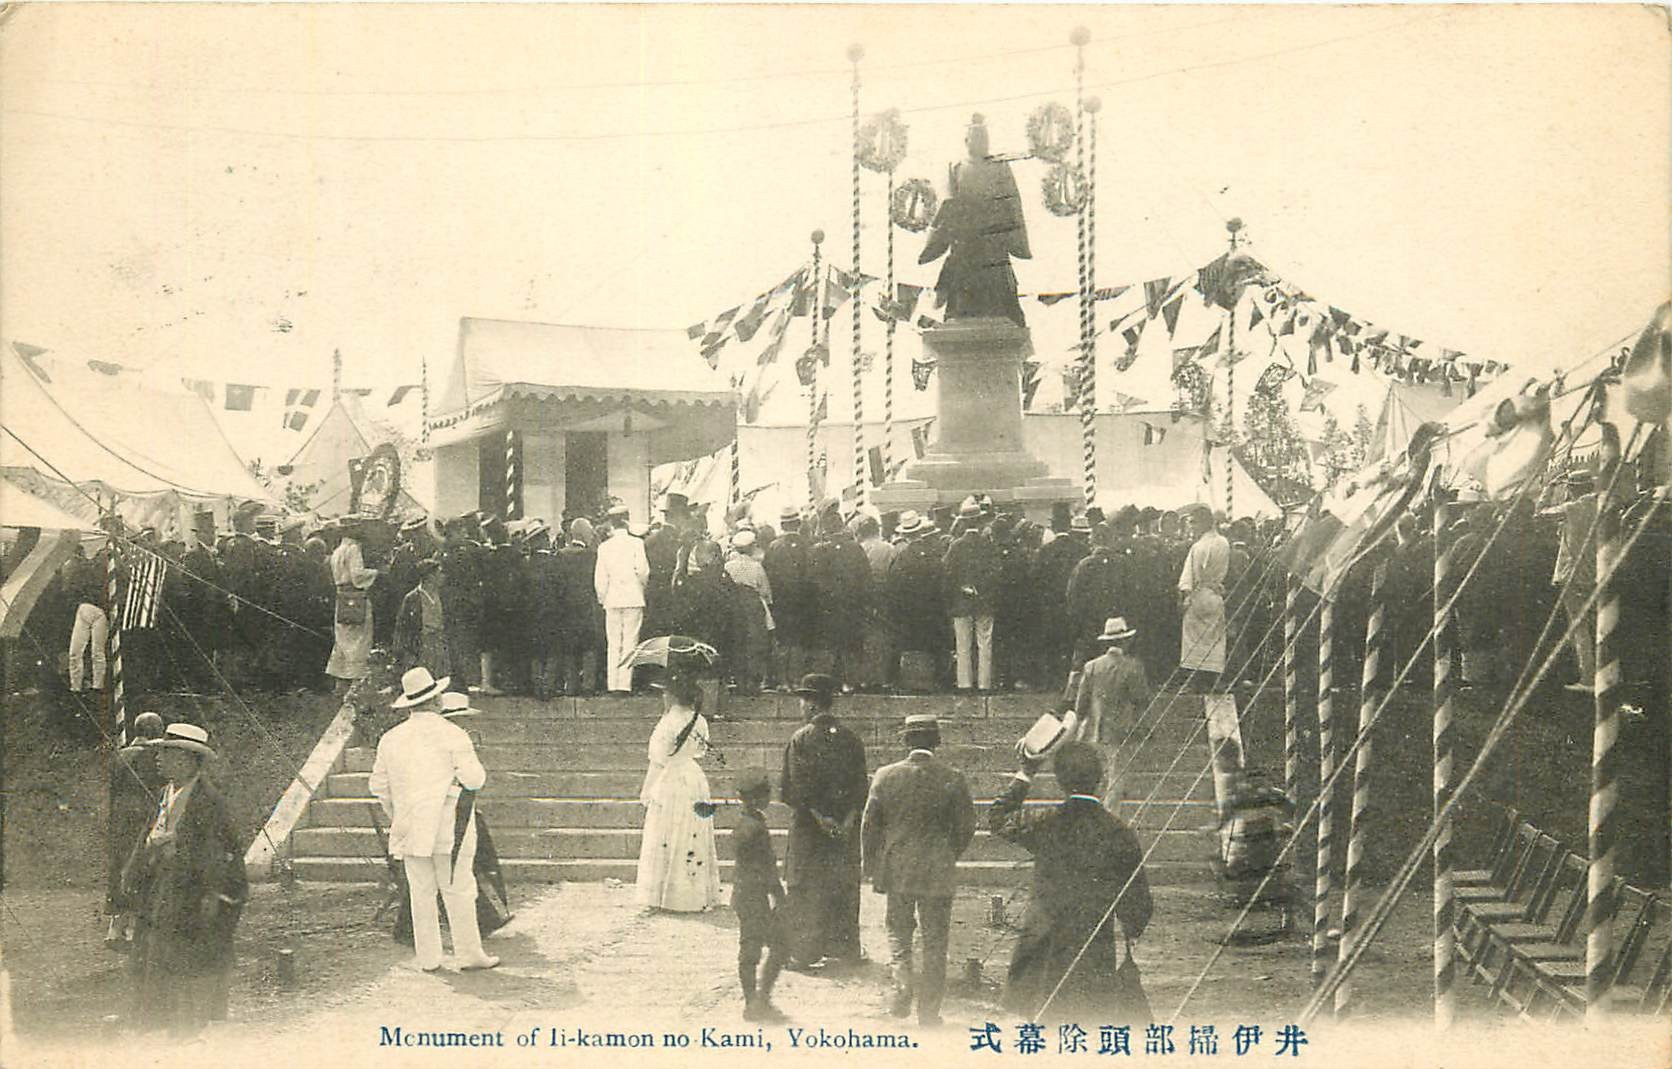 YOKOHAMA. Monument of likamon no Kami 1910 au Japon